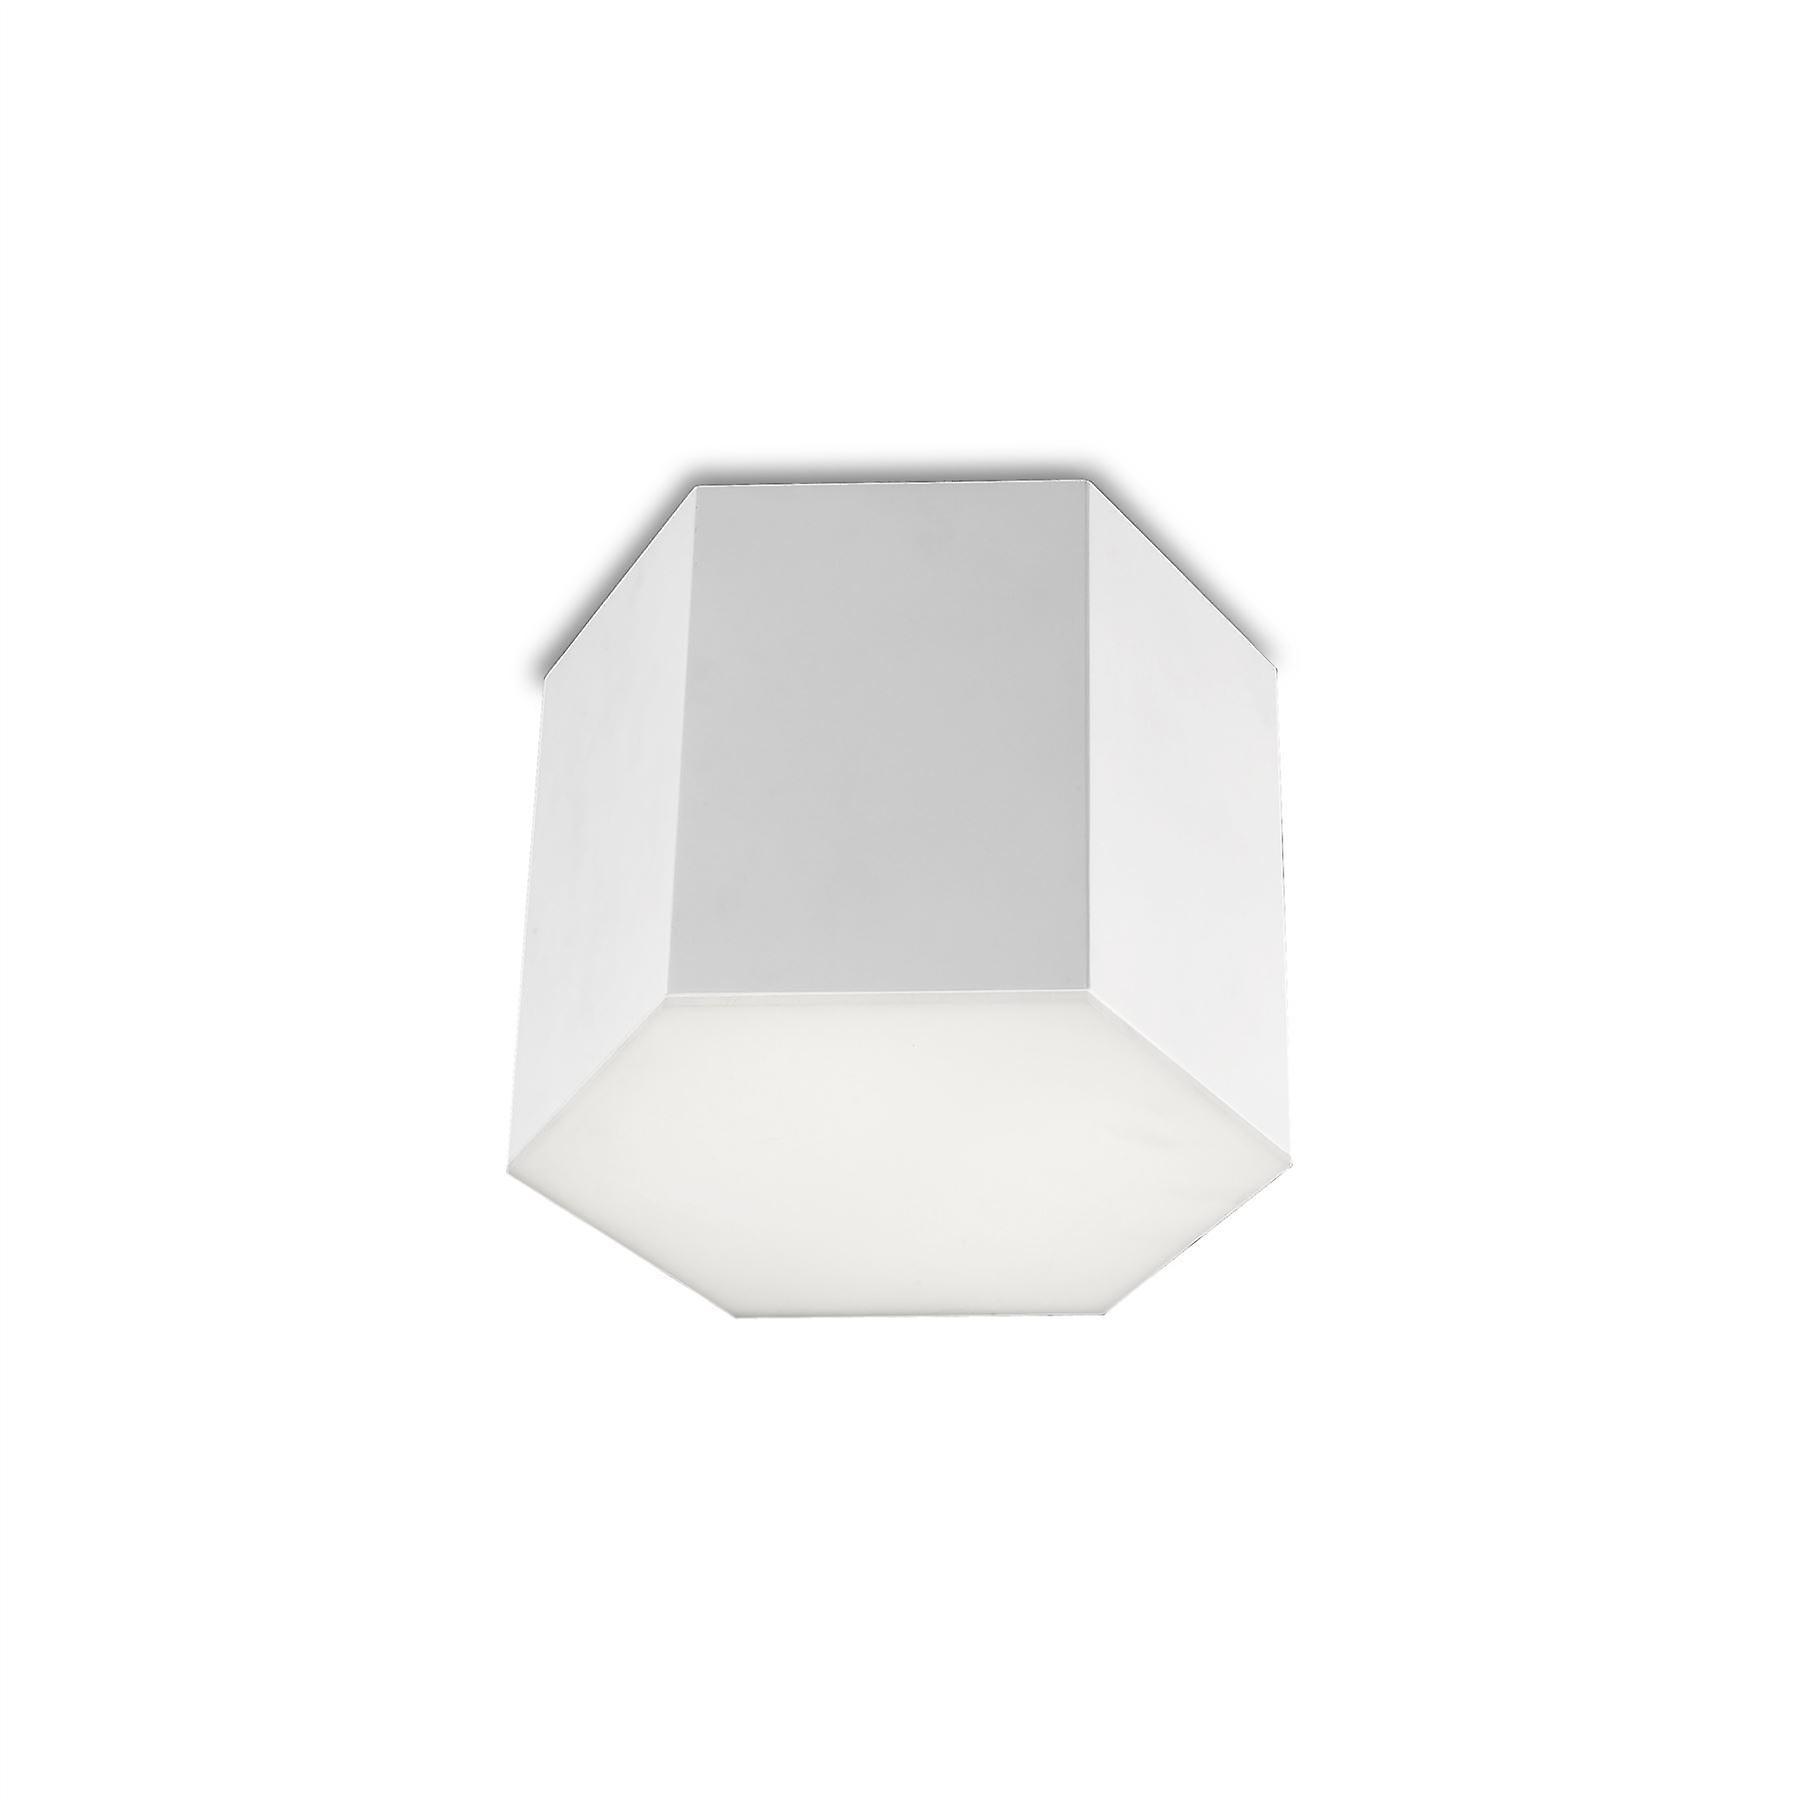 Six Deep blanc Flush LED Ceiling Light - Grok 15-1959-BW-M1